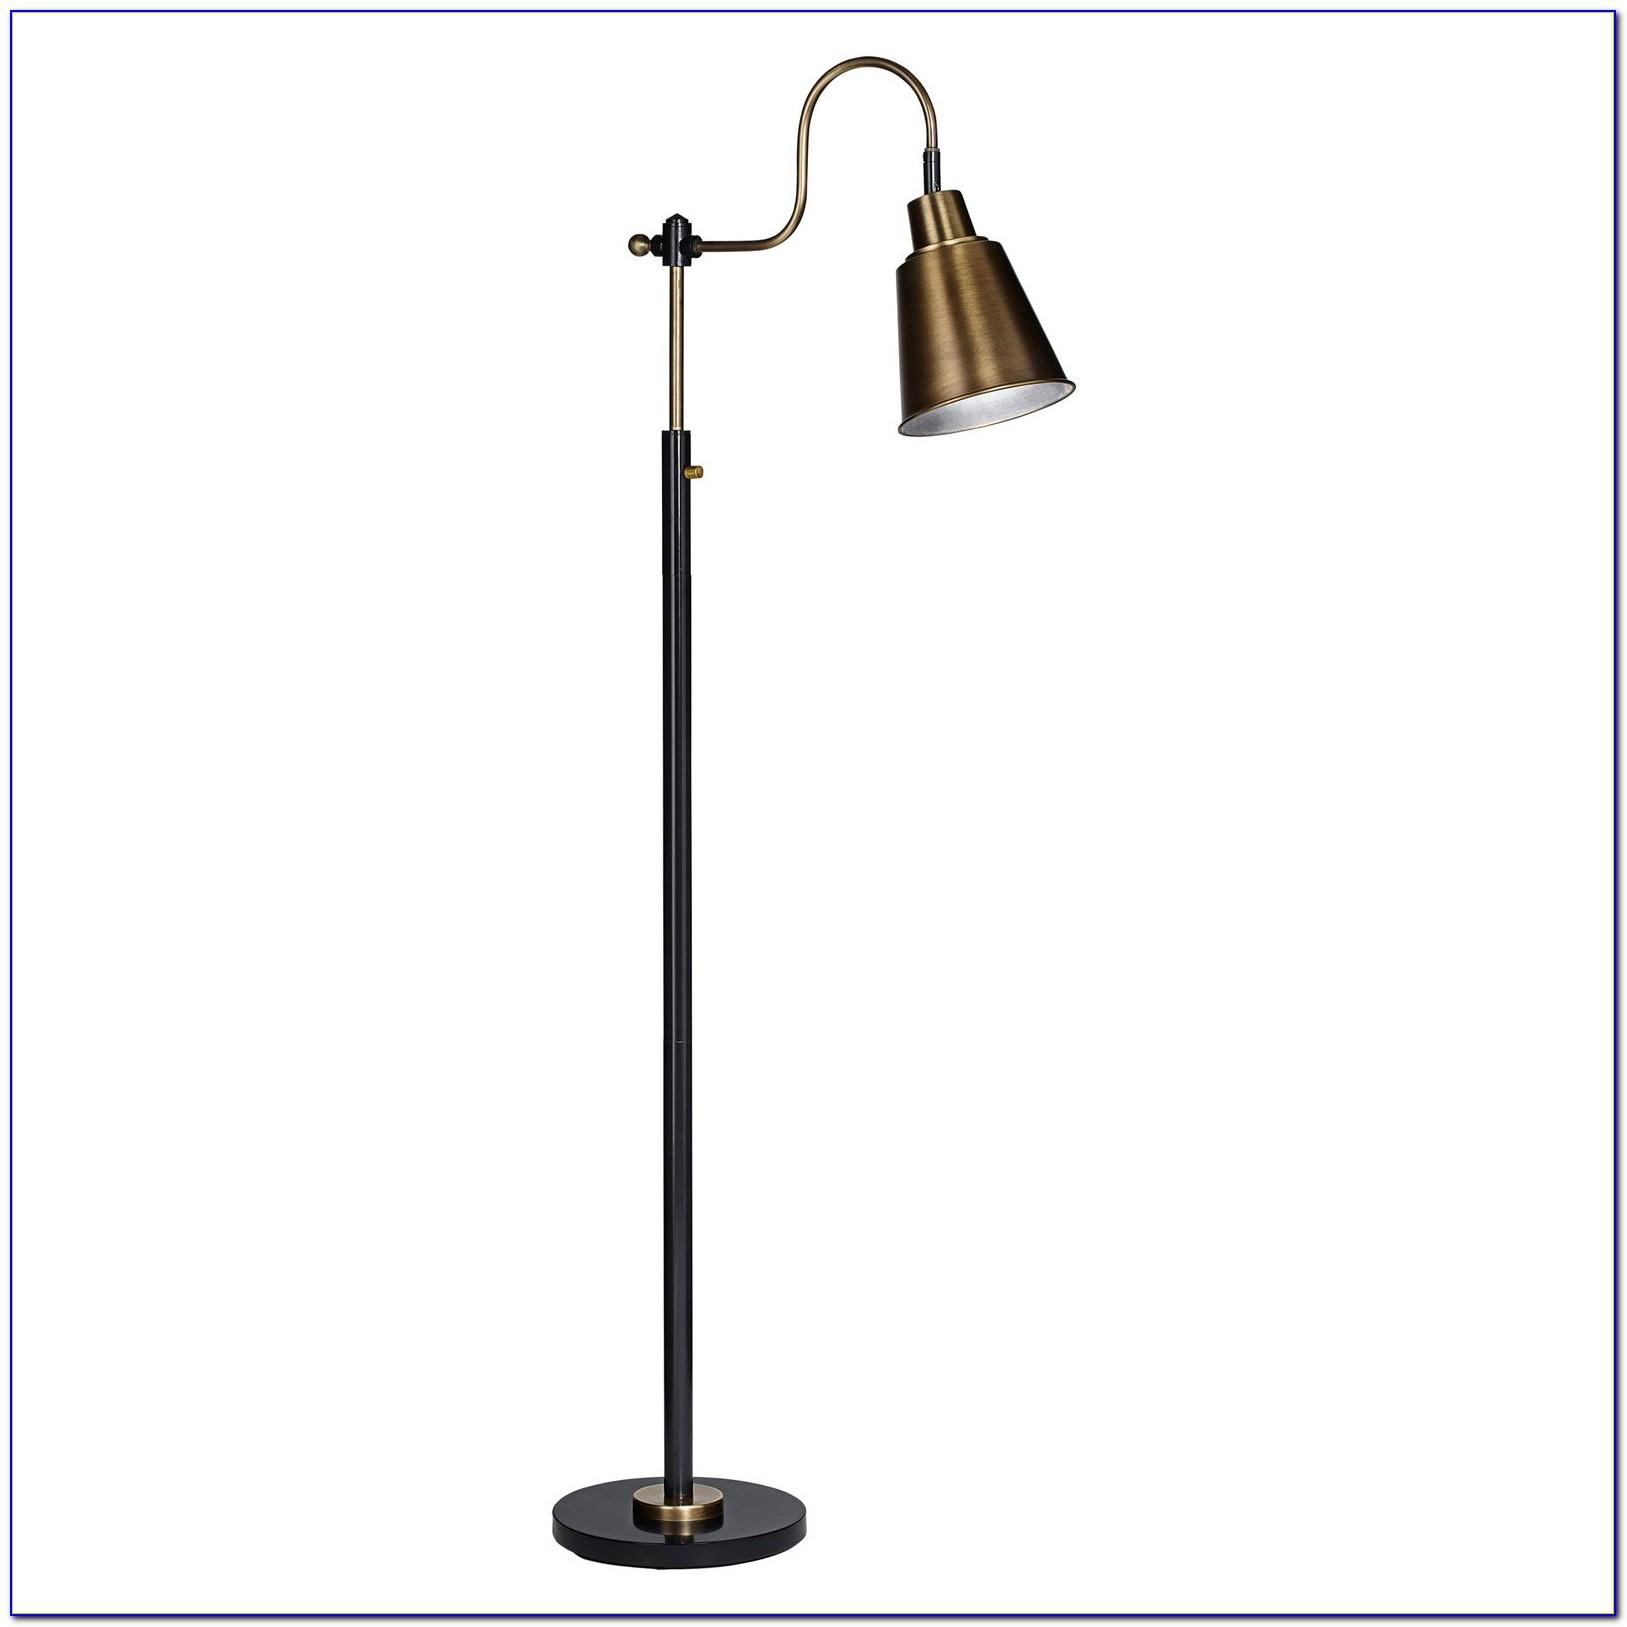 Pacific Coast Lighting Novo Floor Lamp